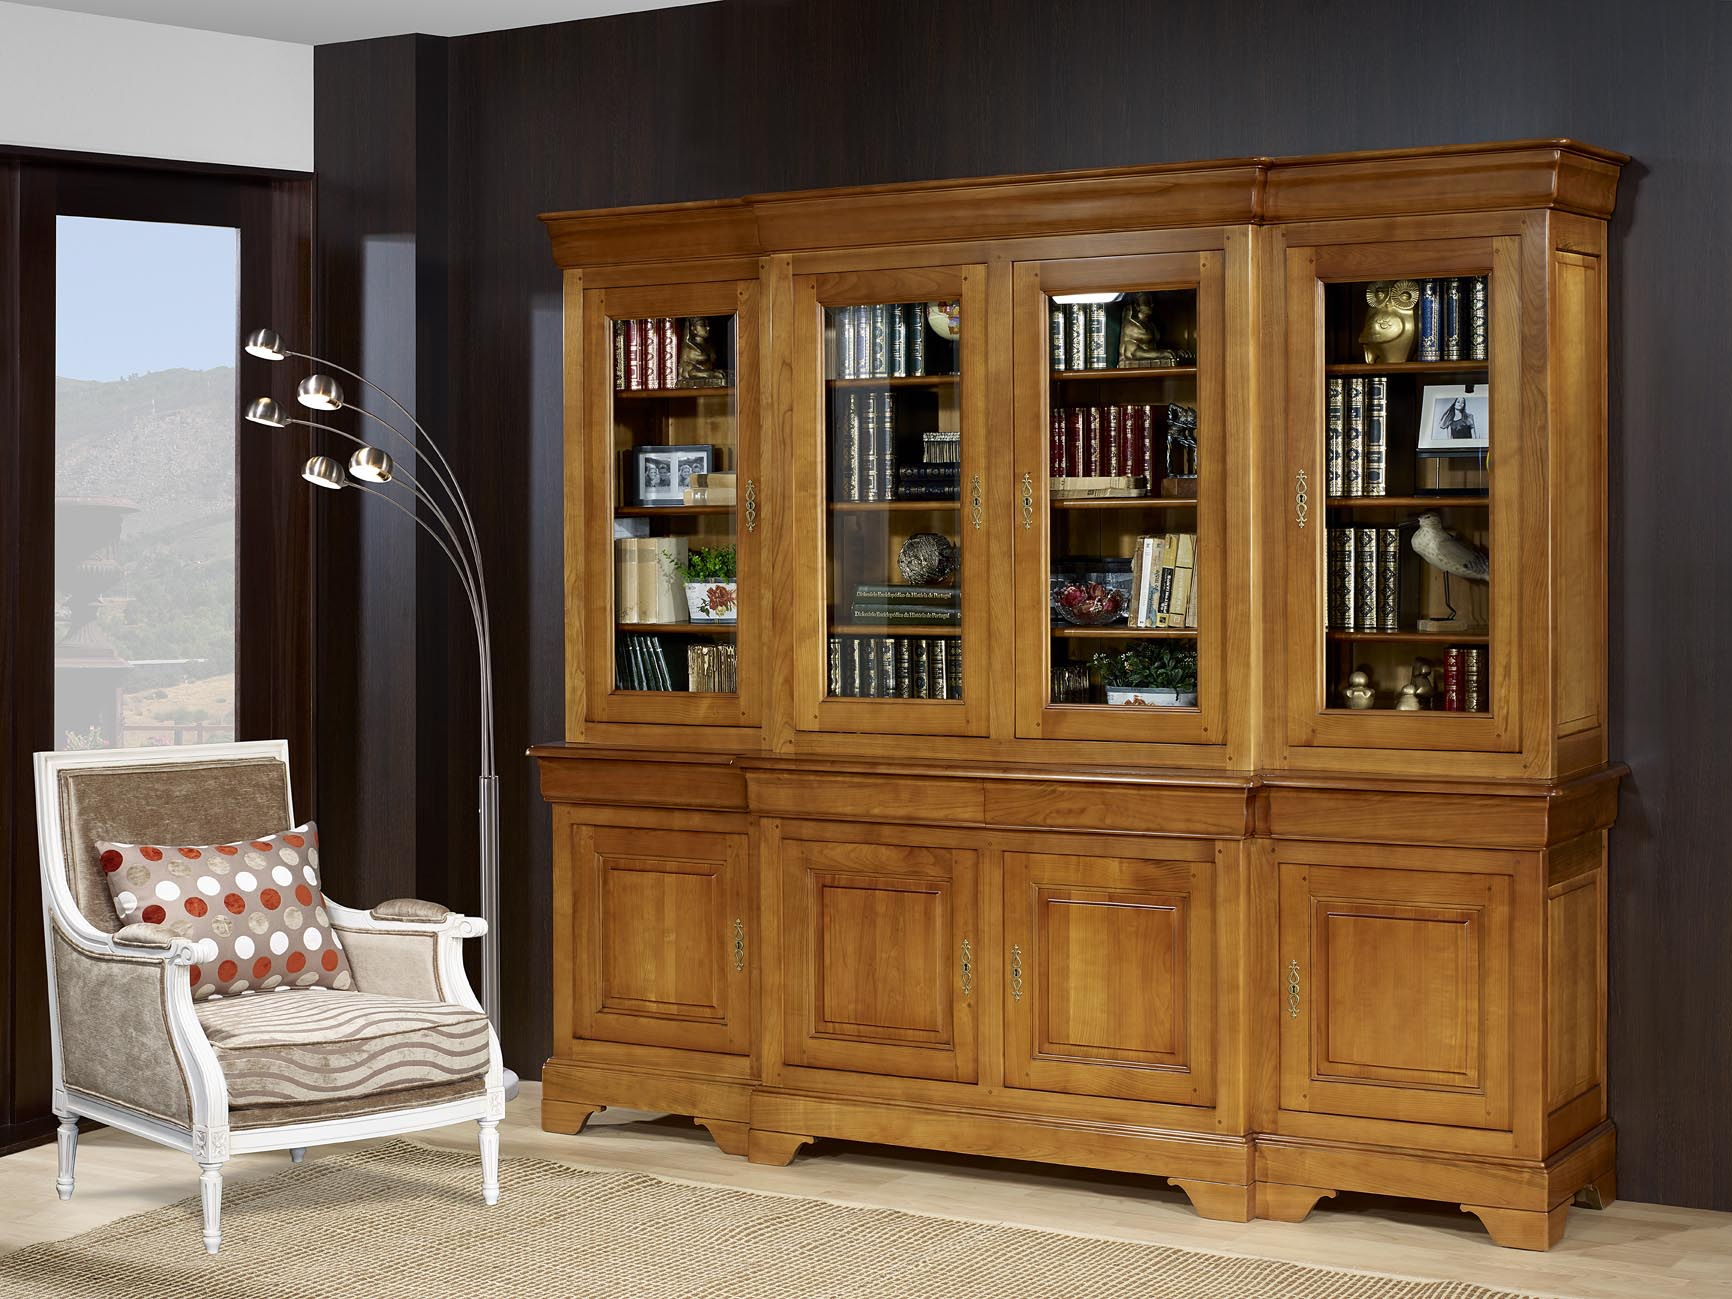 biblioth que 2 corps 4 portes anne laure en merisier. Black Bedroom Furniture Sets. Home Design Ideas